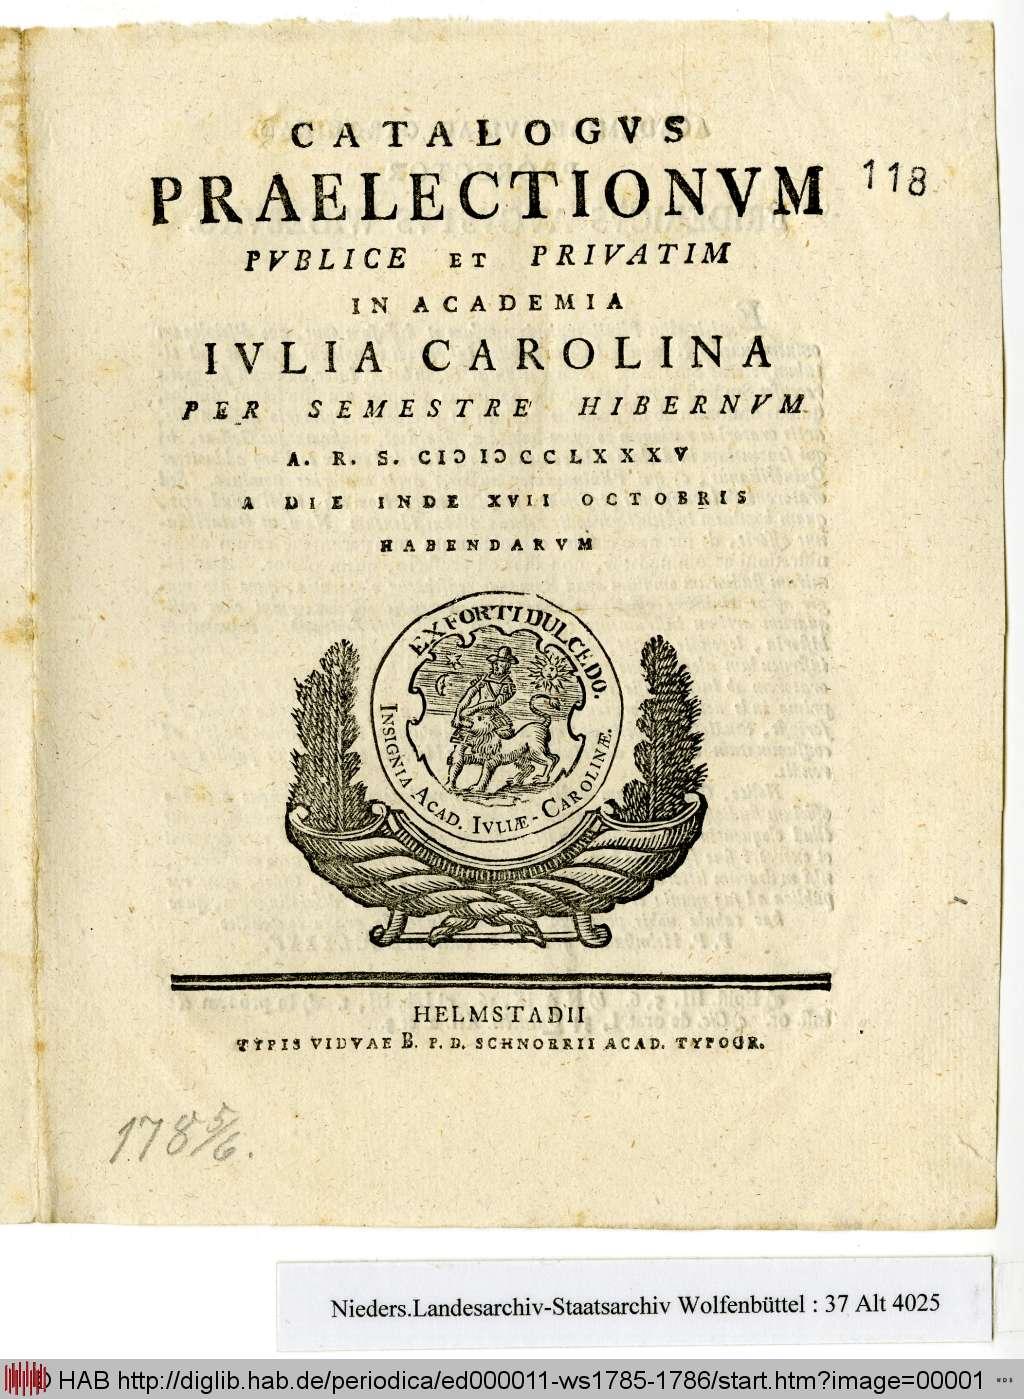 http://diglib.hab.de/periodica/ed000011-ws1785-1786/00001.jpg